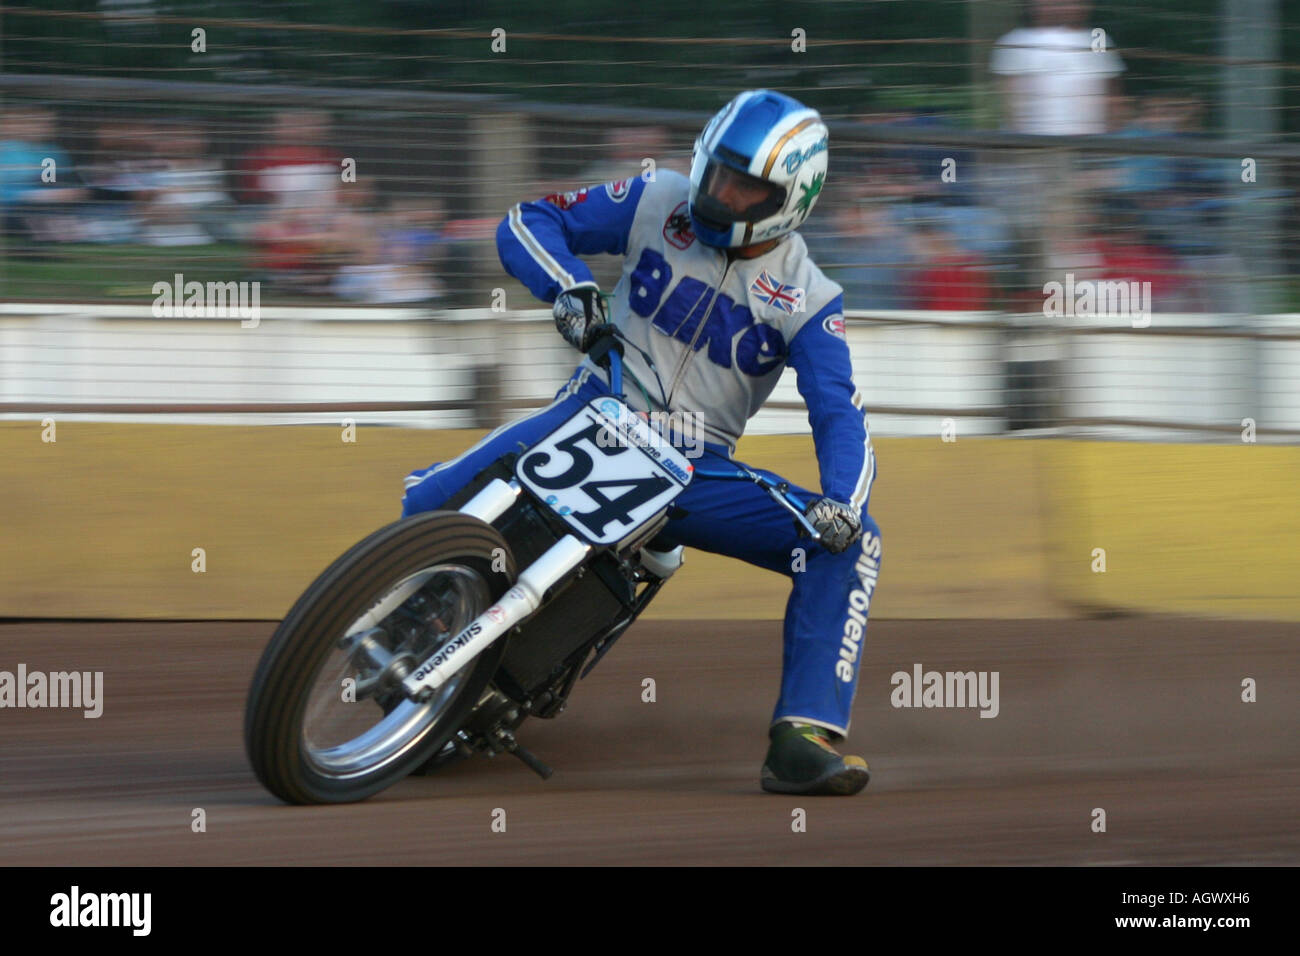 American Dirt Bike 001 Stock Photo Royalty Free Image 8167573